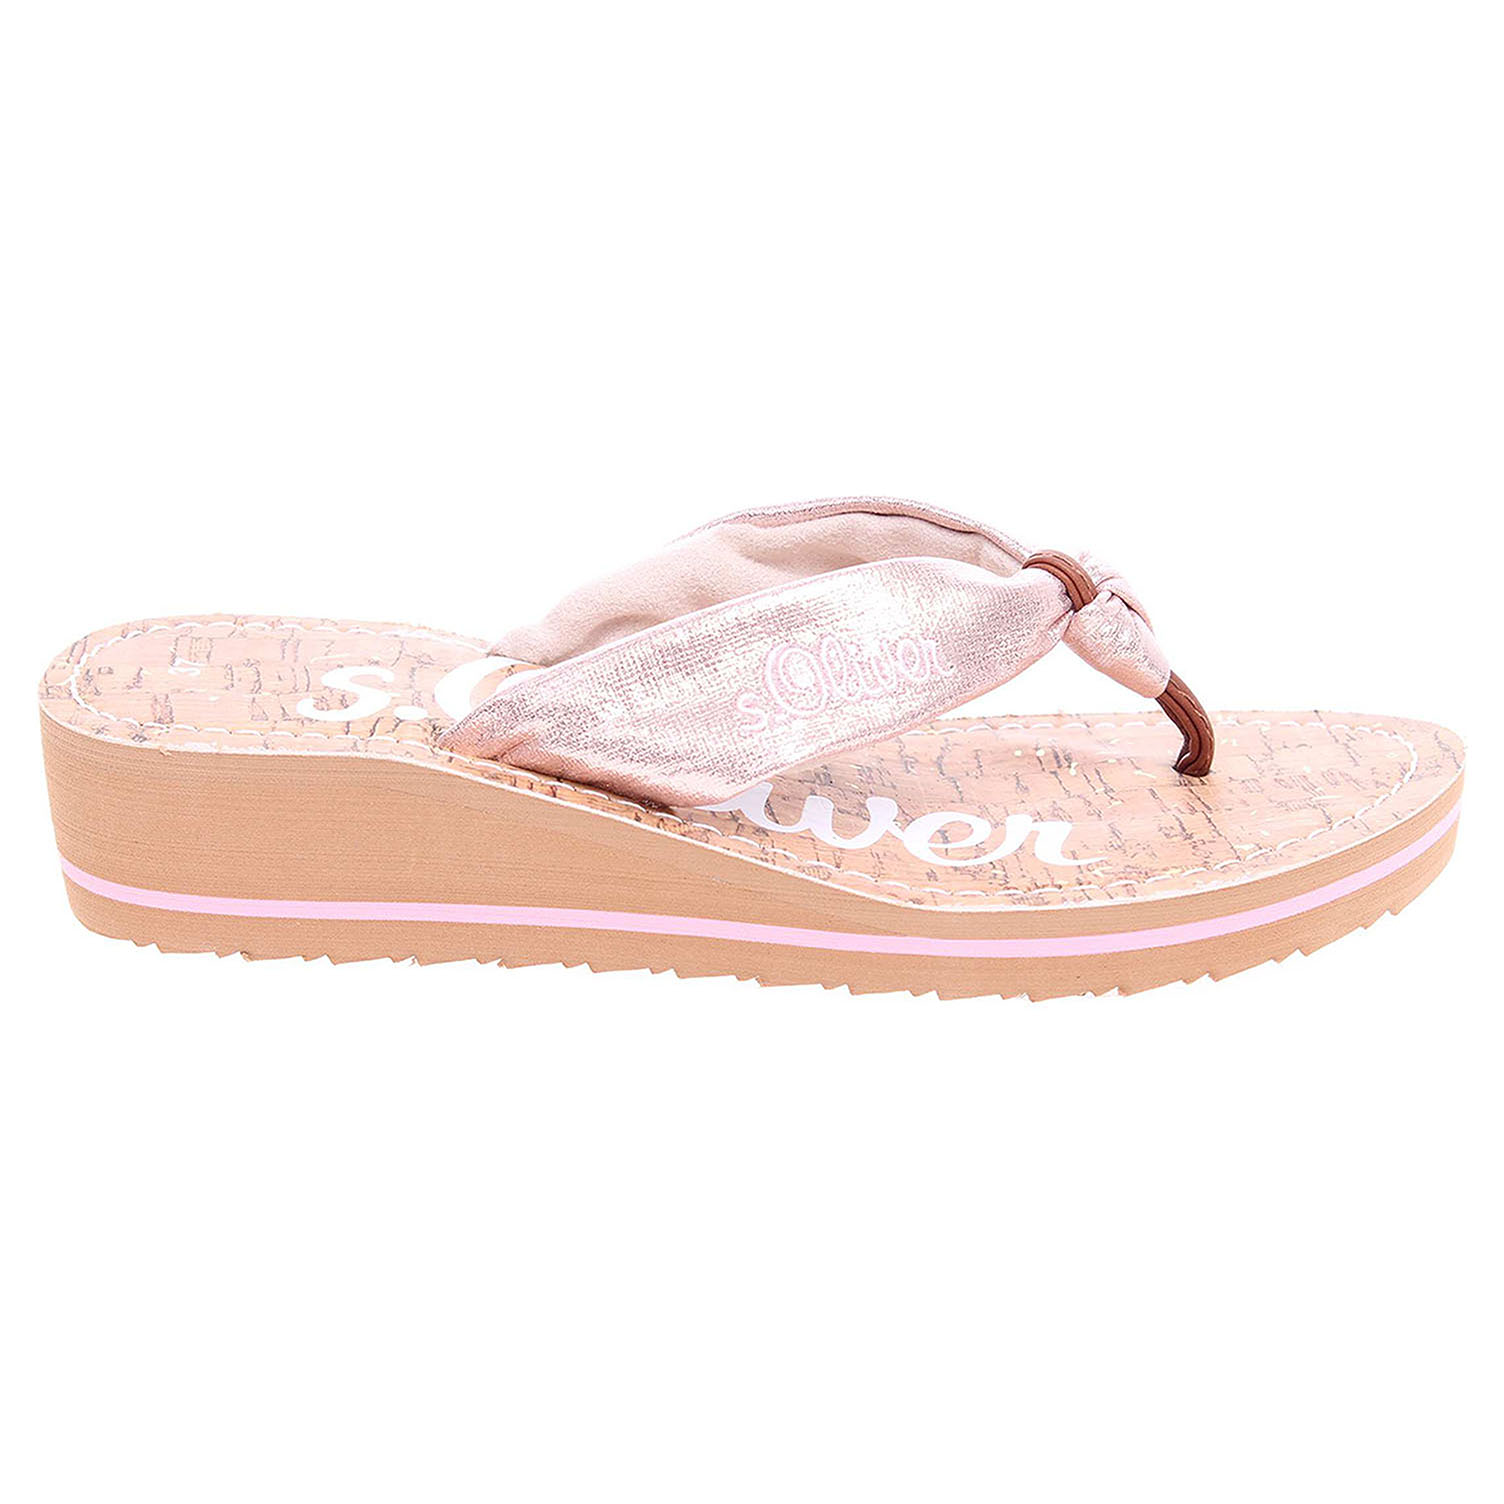 Ecco s.Oliver dámské pantofle 5-27117-38 růžové 23700302